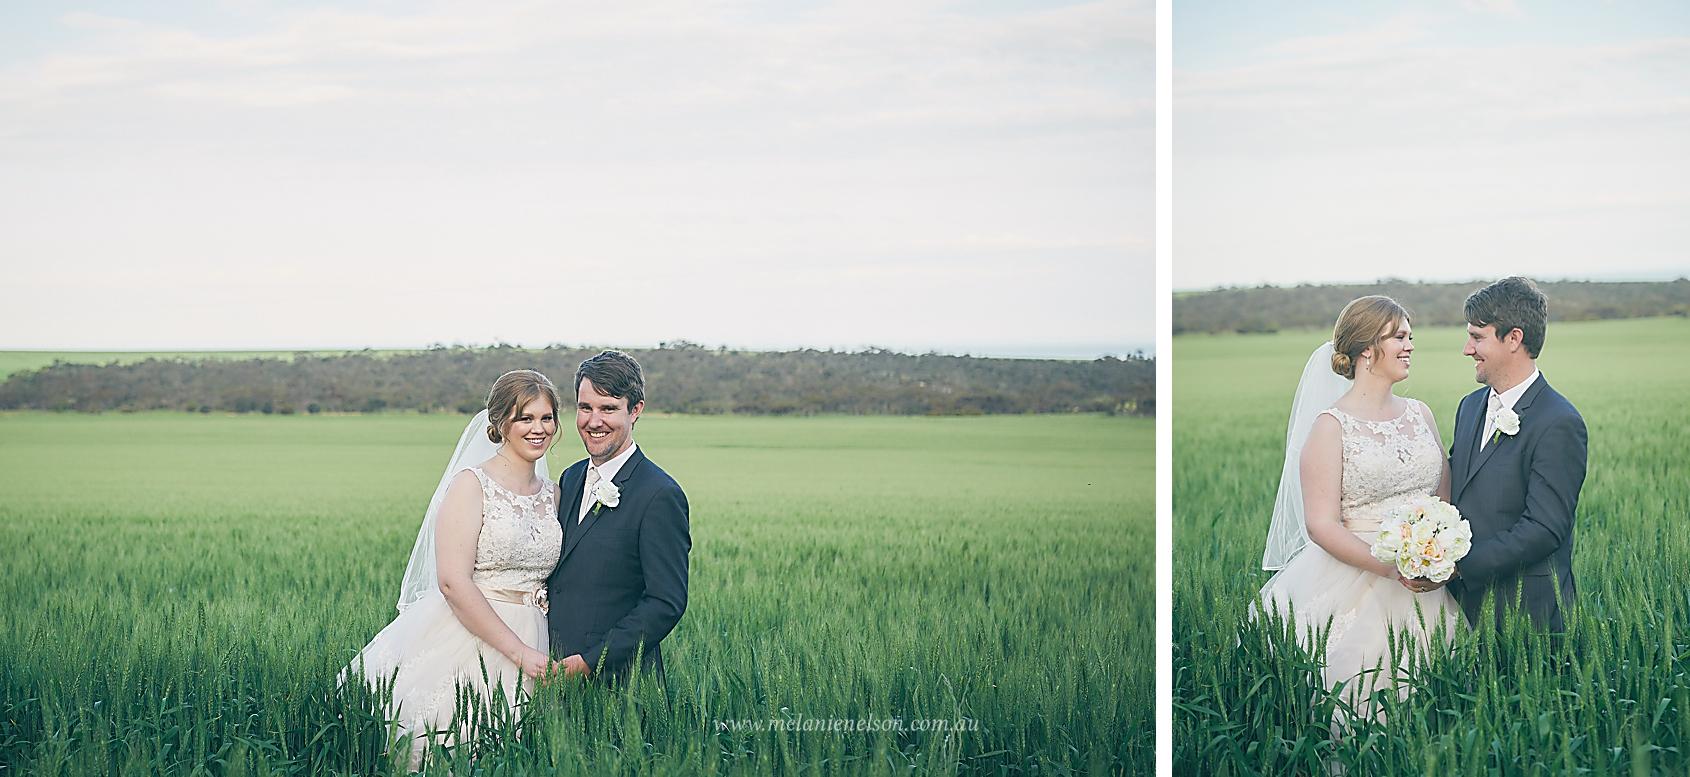 yorke_peninsula_wedding_photographer_0077.jpg